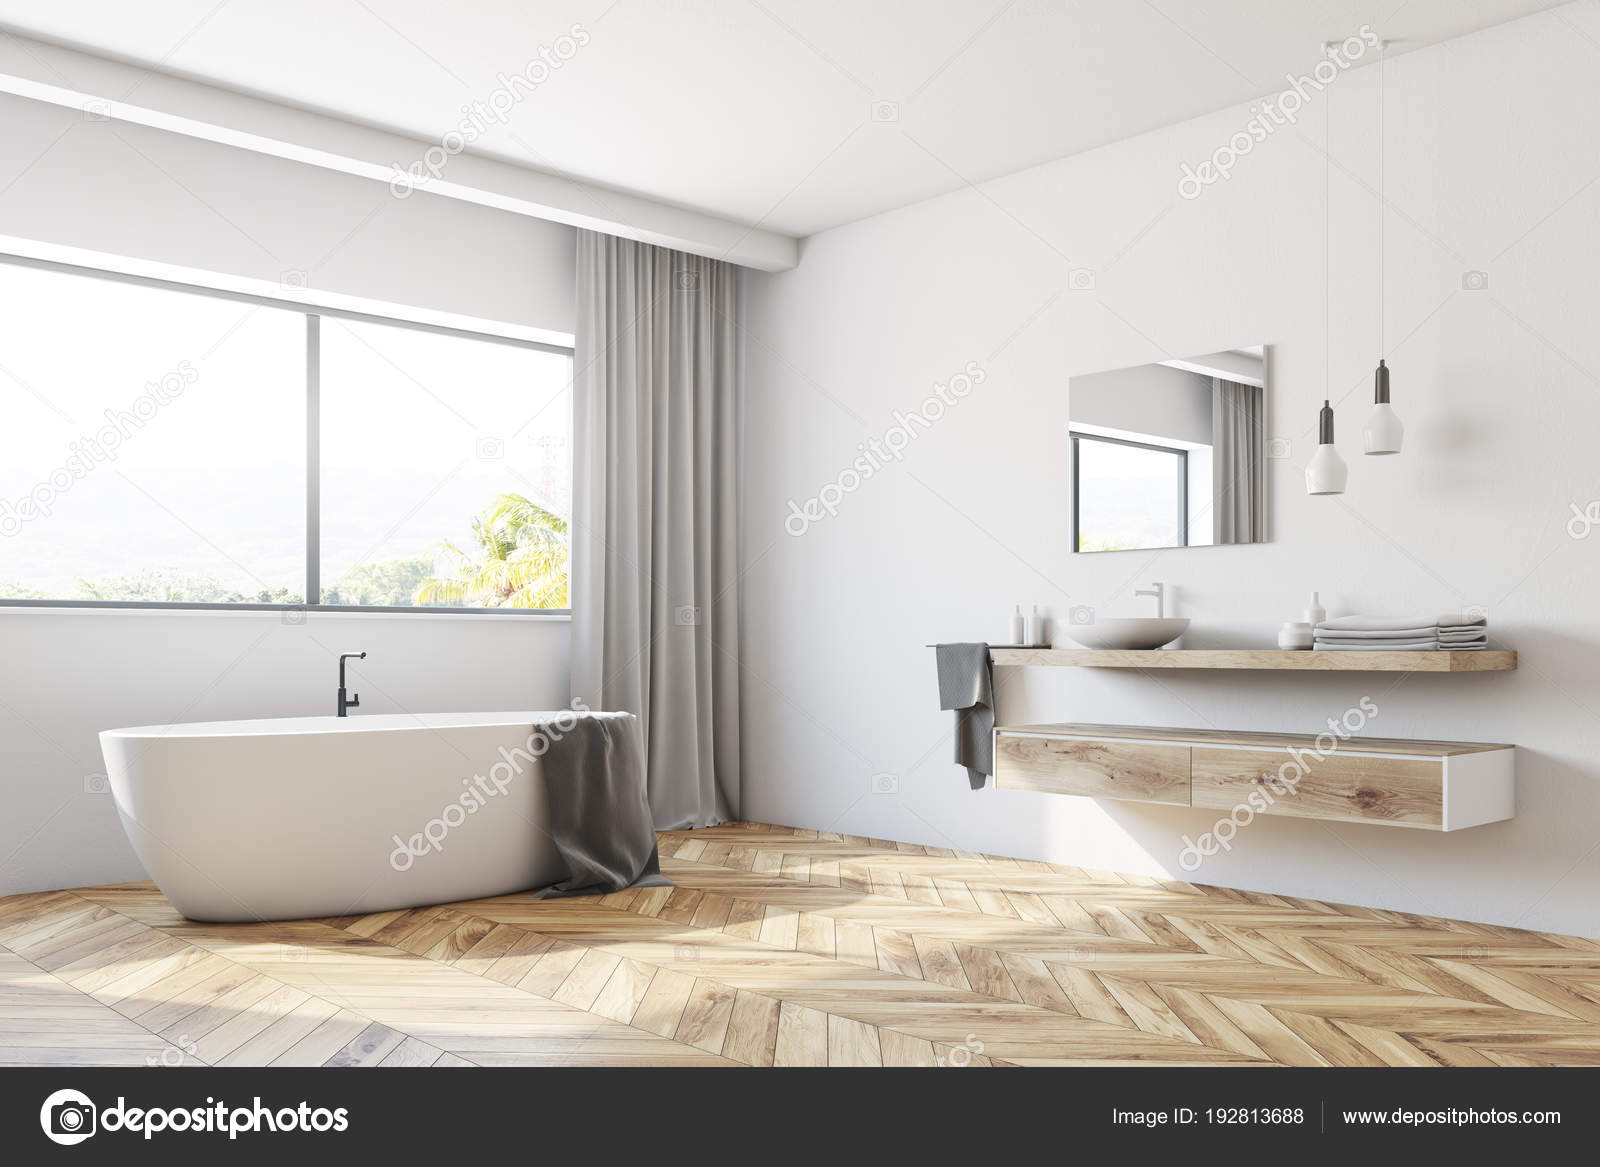 Moderne Witte Badkamer : Moderne witte badkamer hoek u2014 stockfoto © denisismagilov #192813688